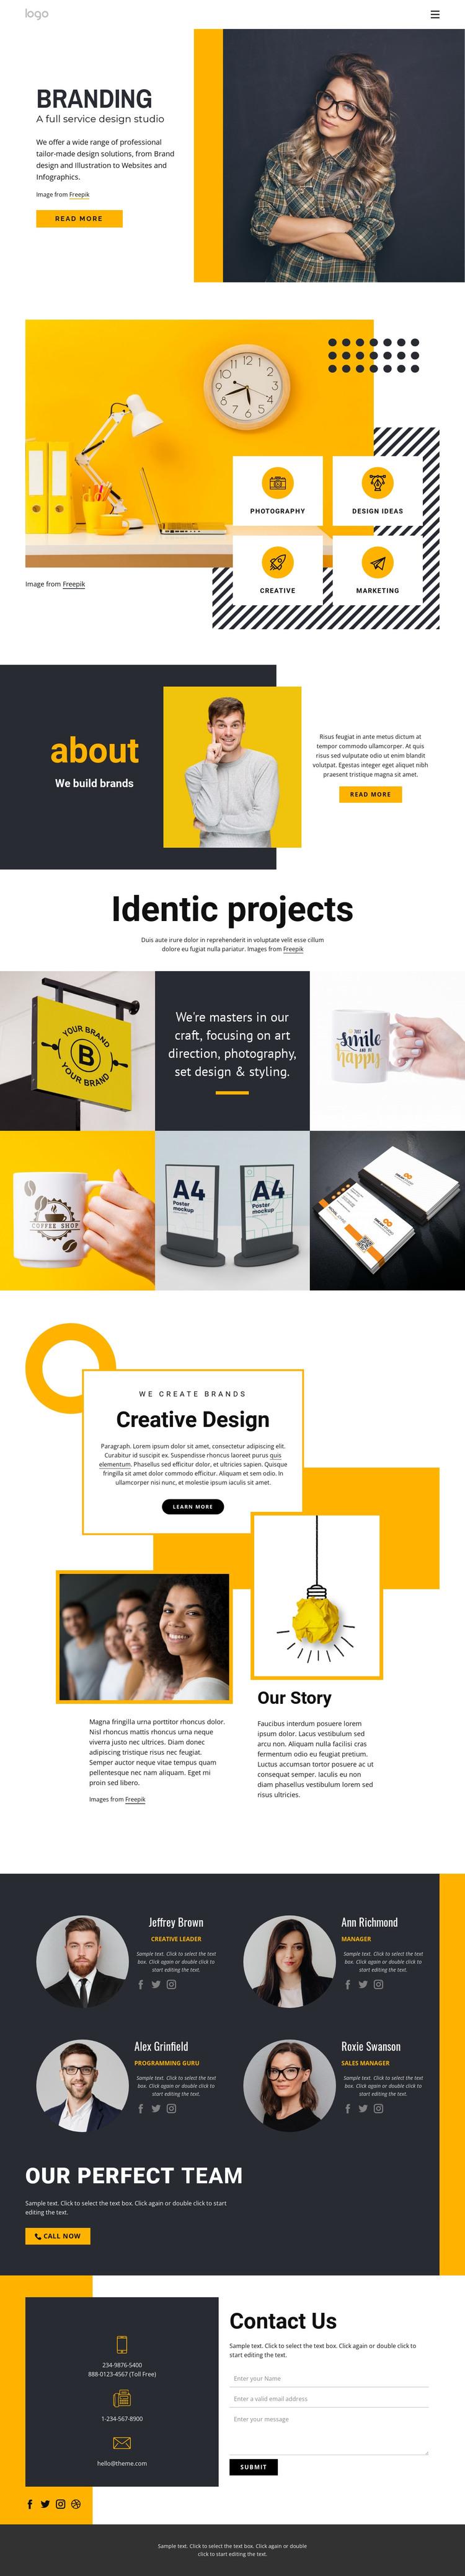 Full-service design studio HTML Template